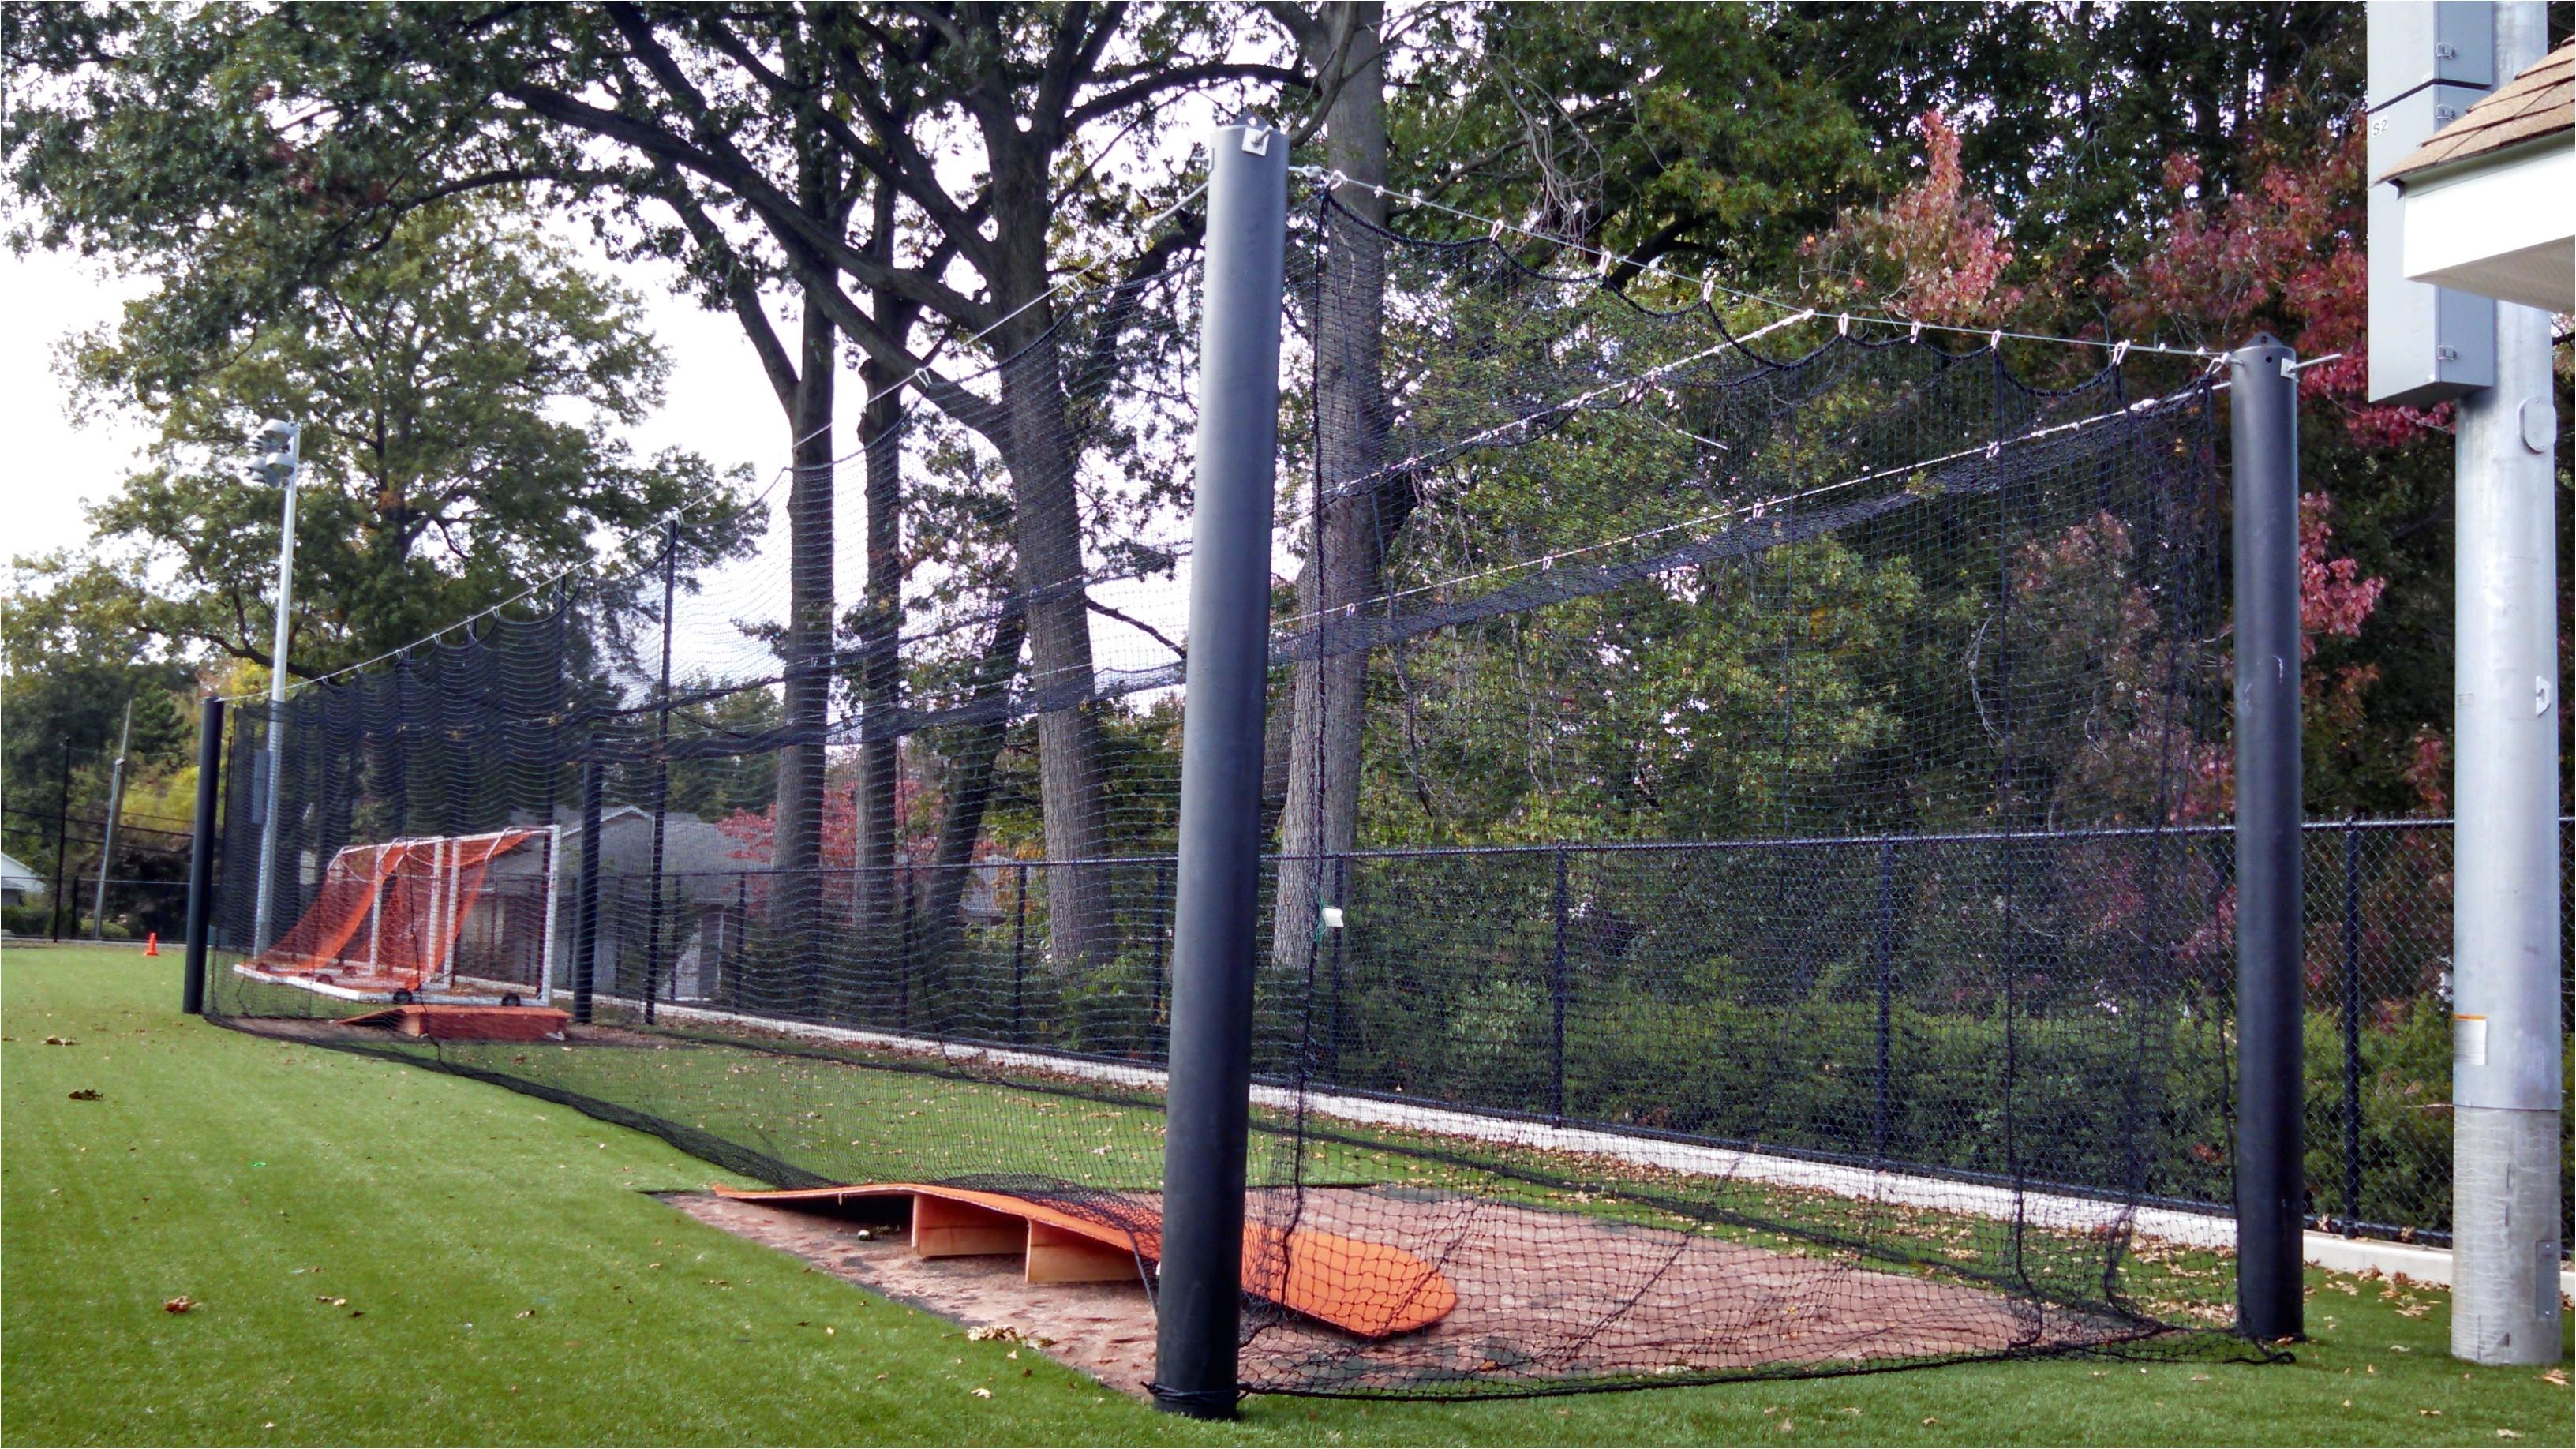 baseball cages z3ugcm0xit 7c2cx 7czupqphxssgeerzdyyersvdhahfww